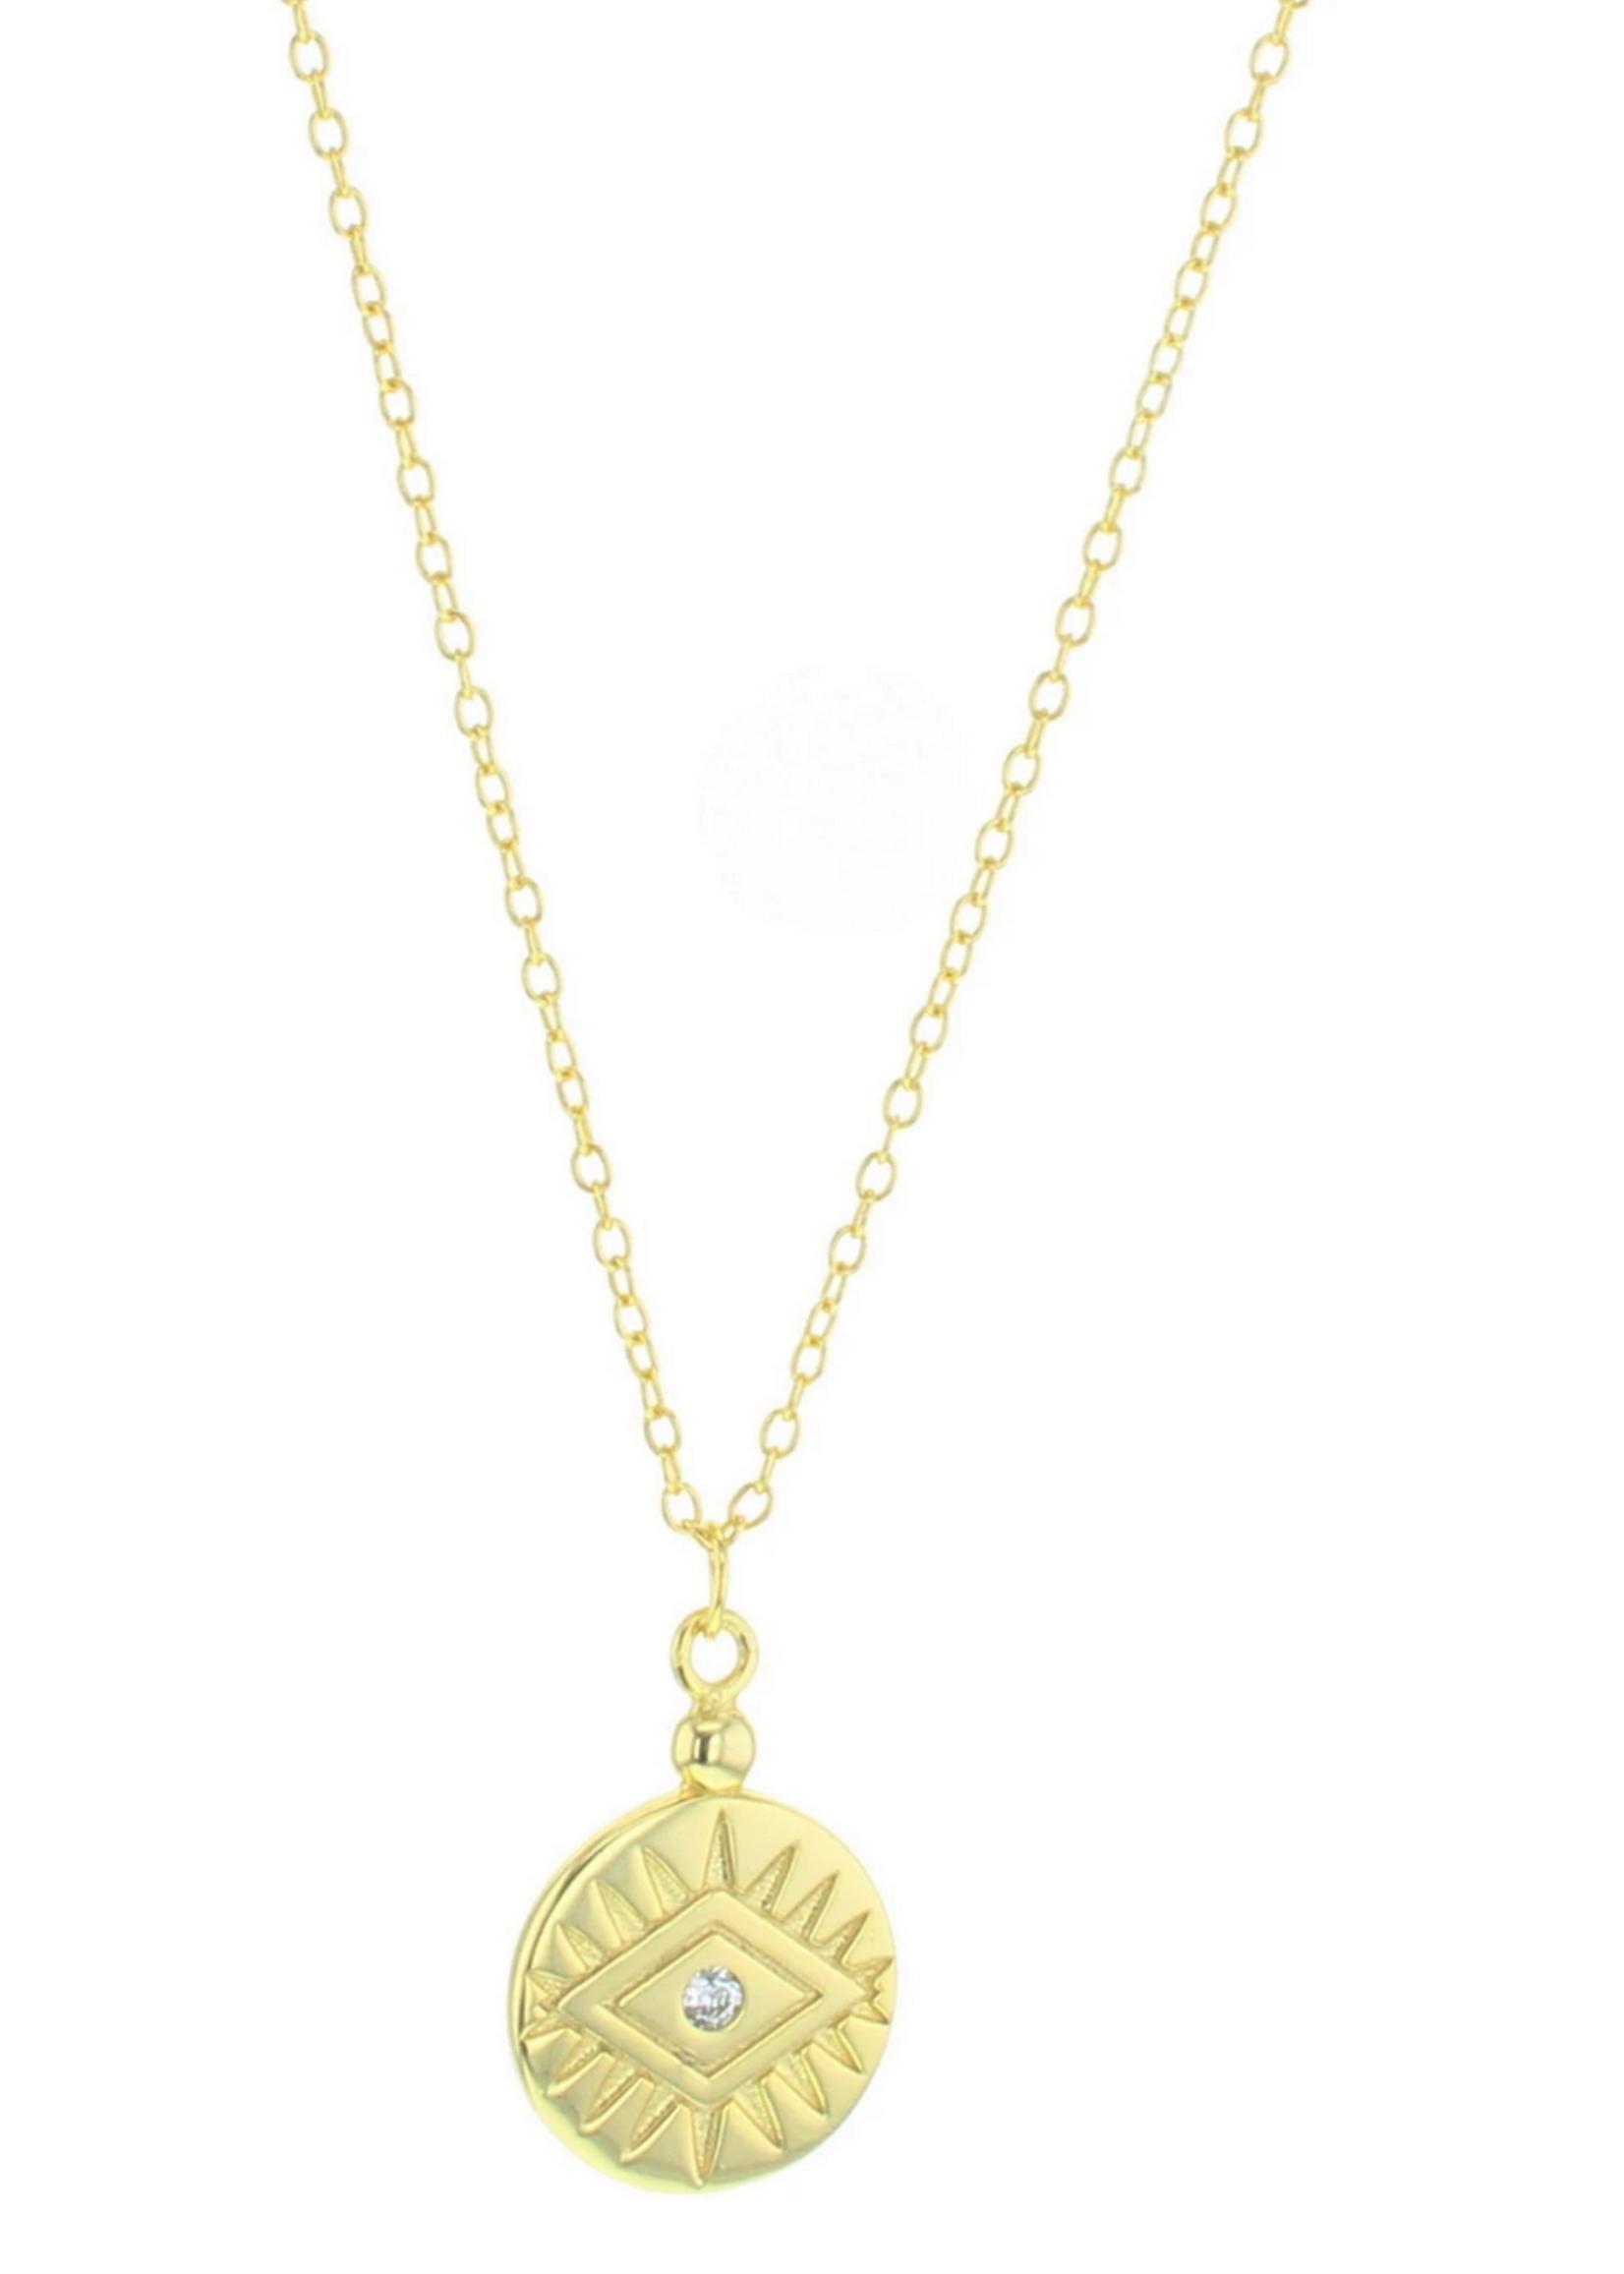 lotus jewelry studio lotus zane necklace